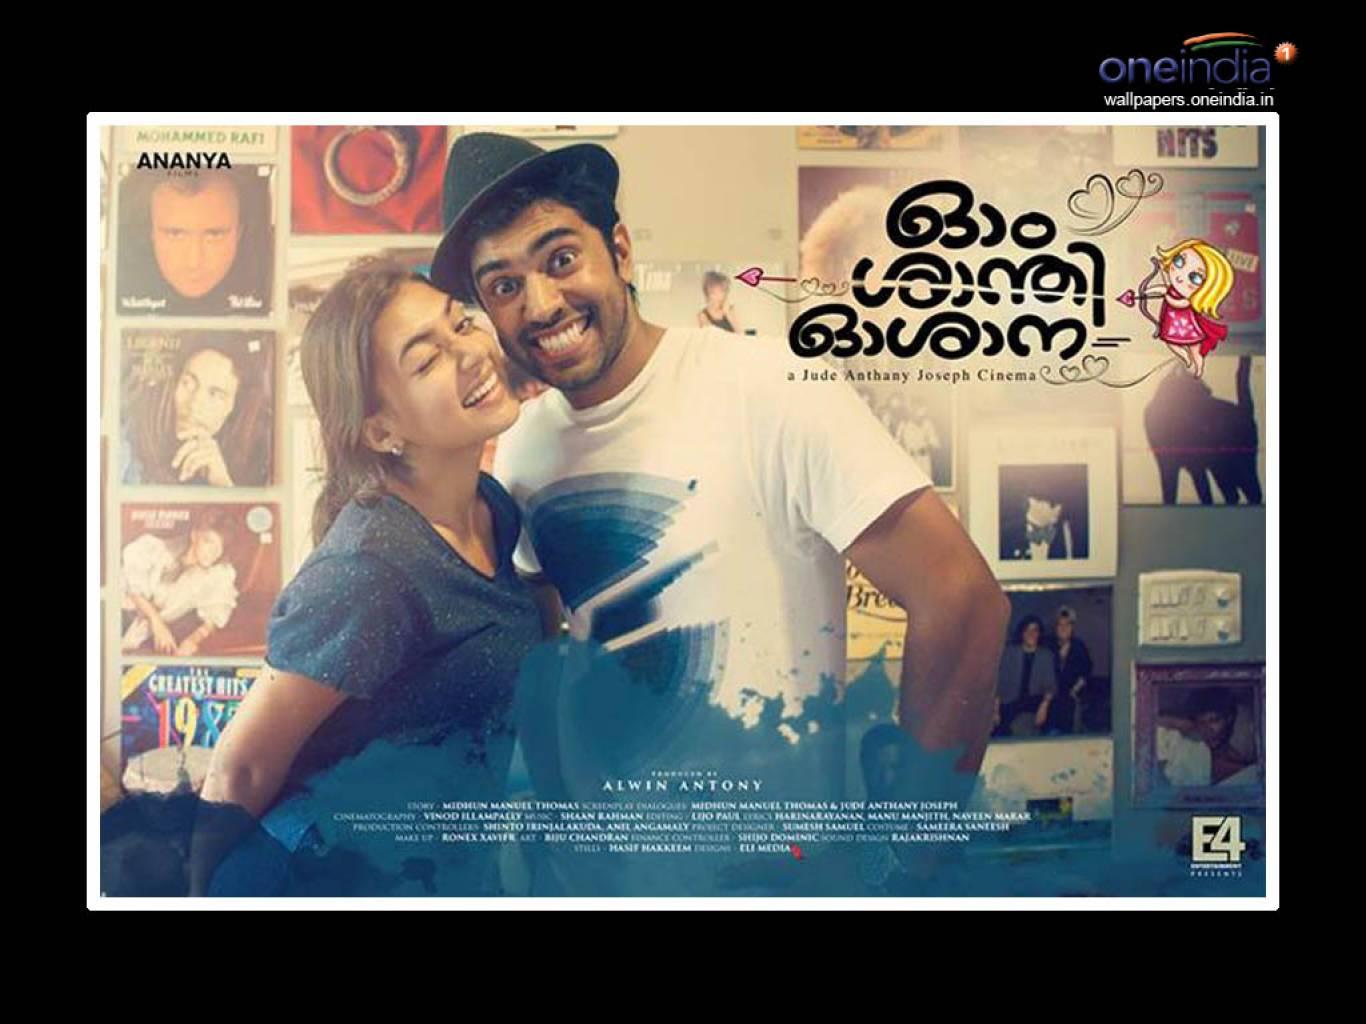 Om Shanti Oshana Movie HD Wallpapers | Om Shanti Oshana HD ...